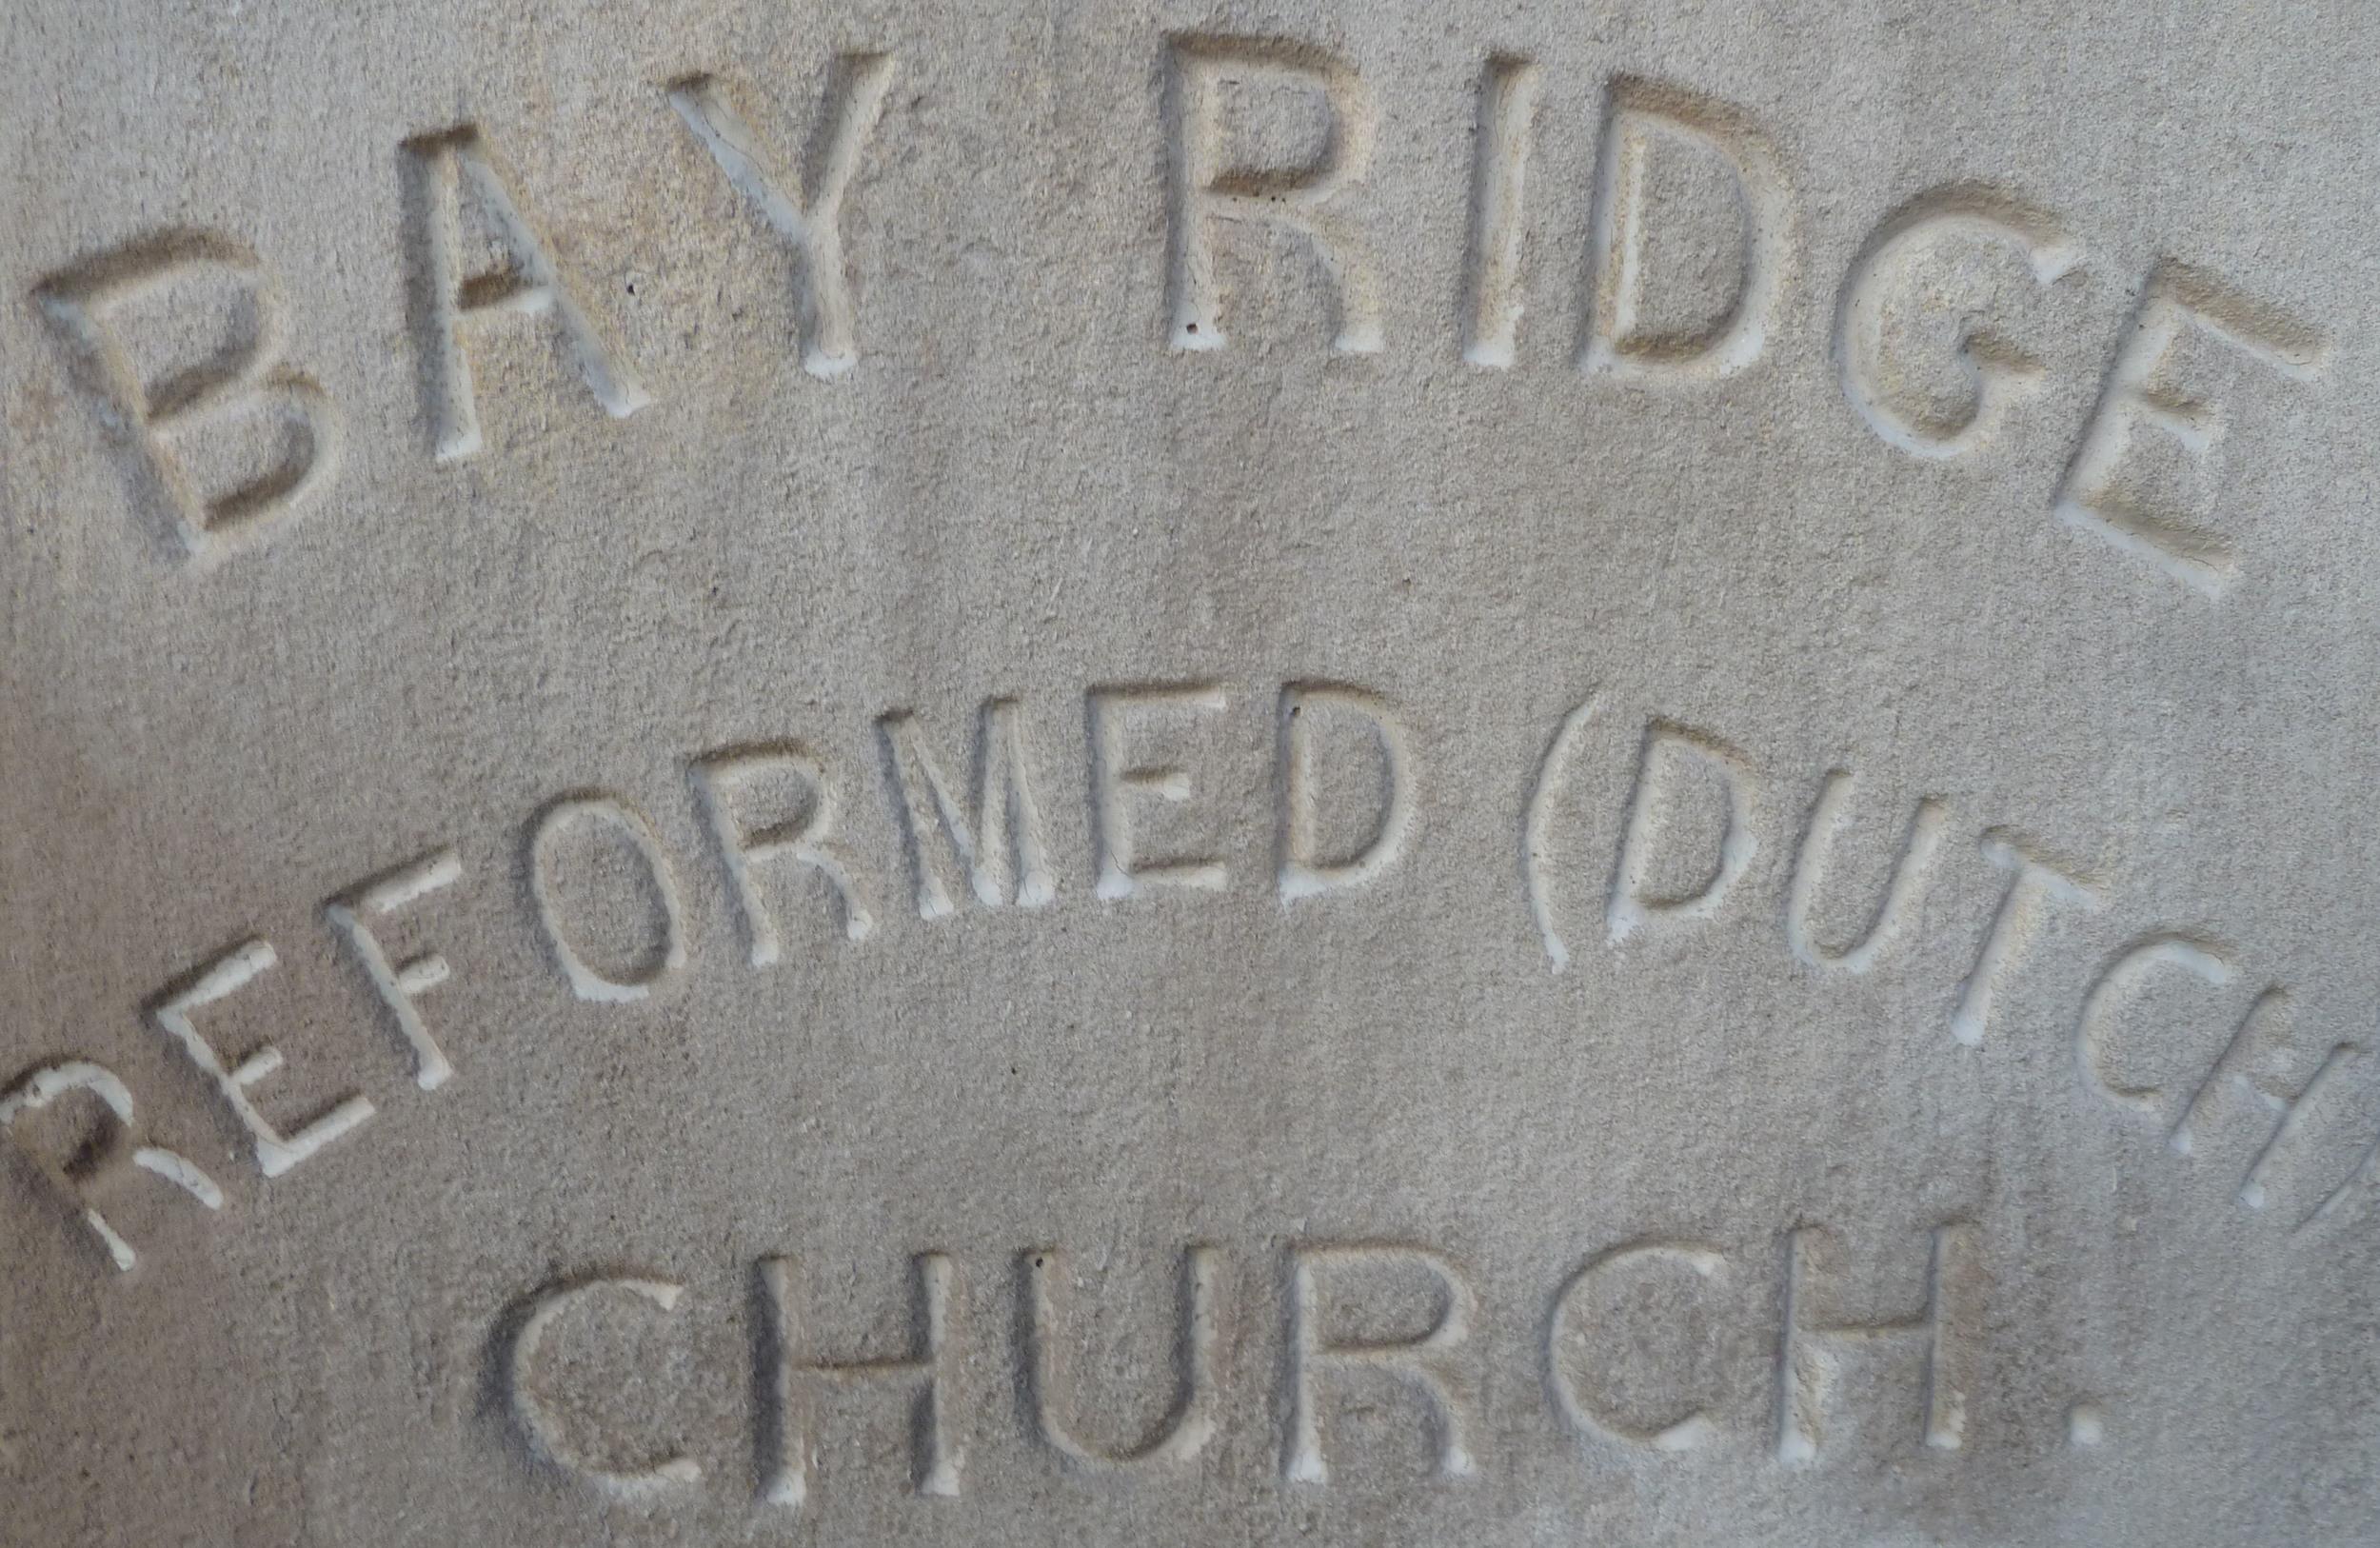 church cornerstone, 1896